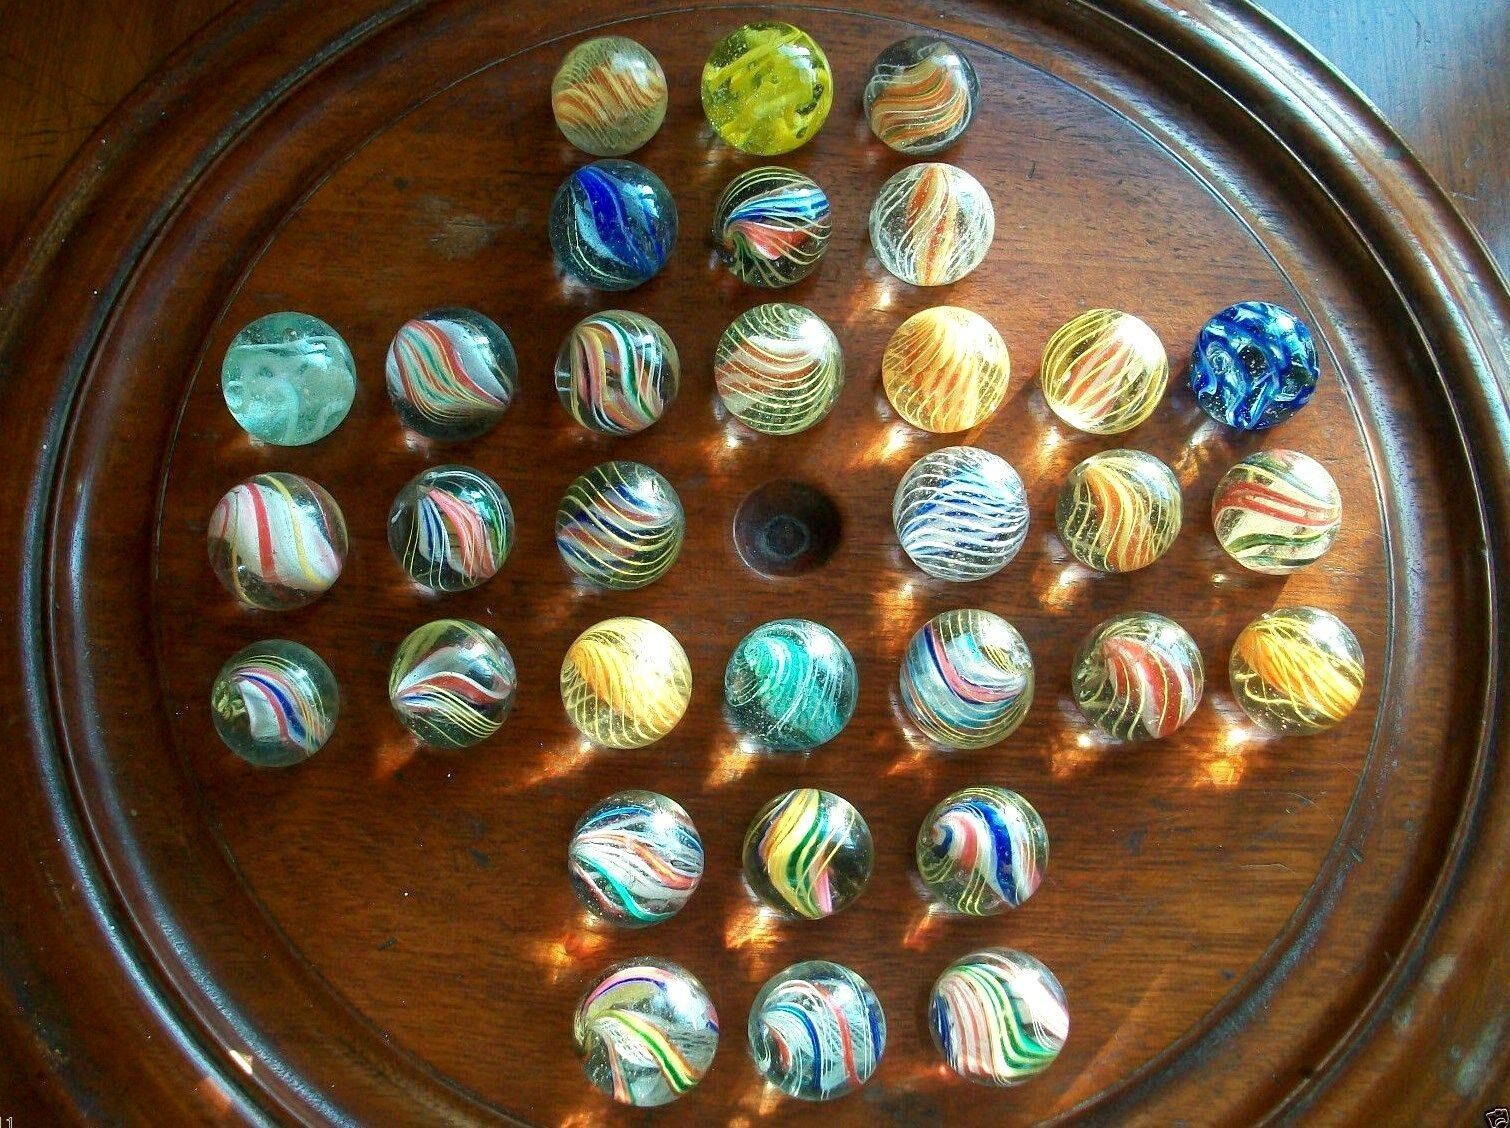 Colección Raro Antiguo Vintage Coleccionable Hecho a mano Glass Marbles